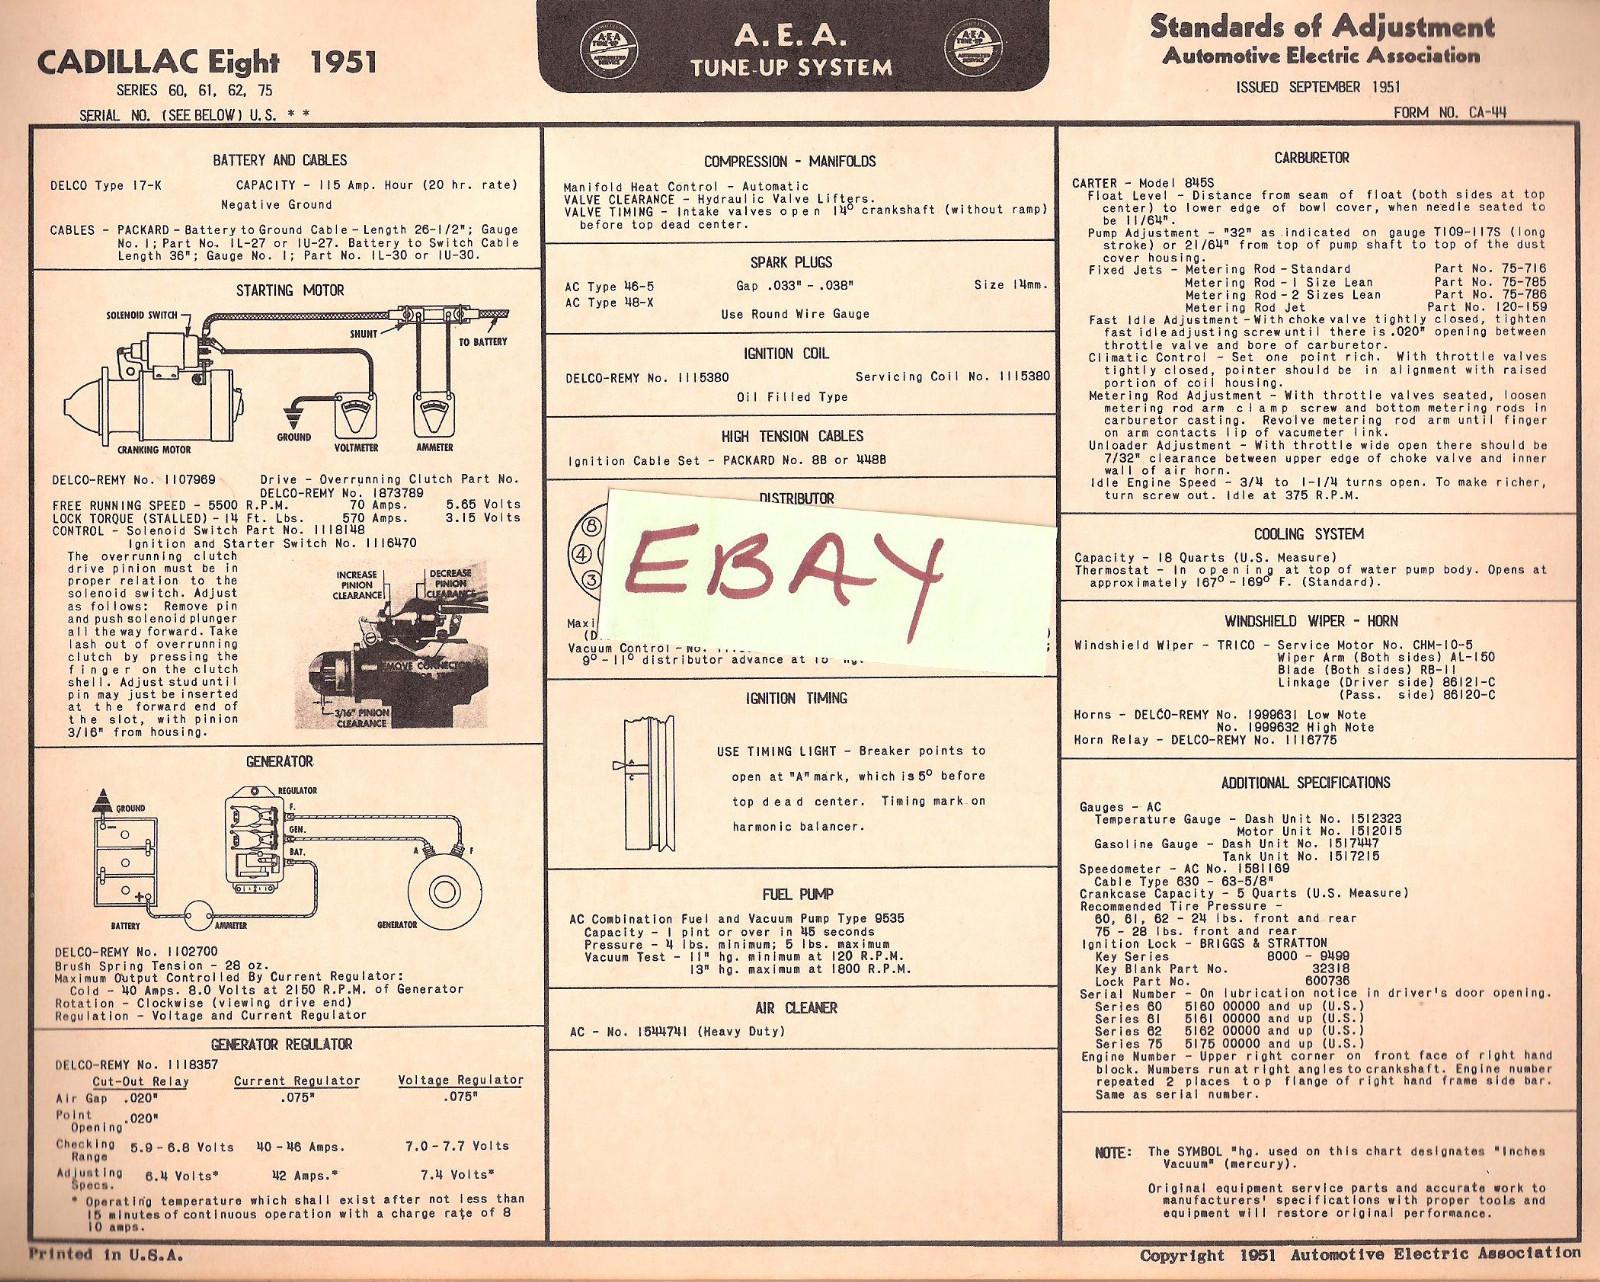 1951 AEA Tune-up Chart & Wiring Diagram Cadillac Eight (8) Series  60,61,62,75